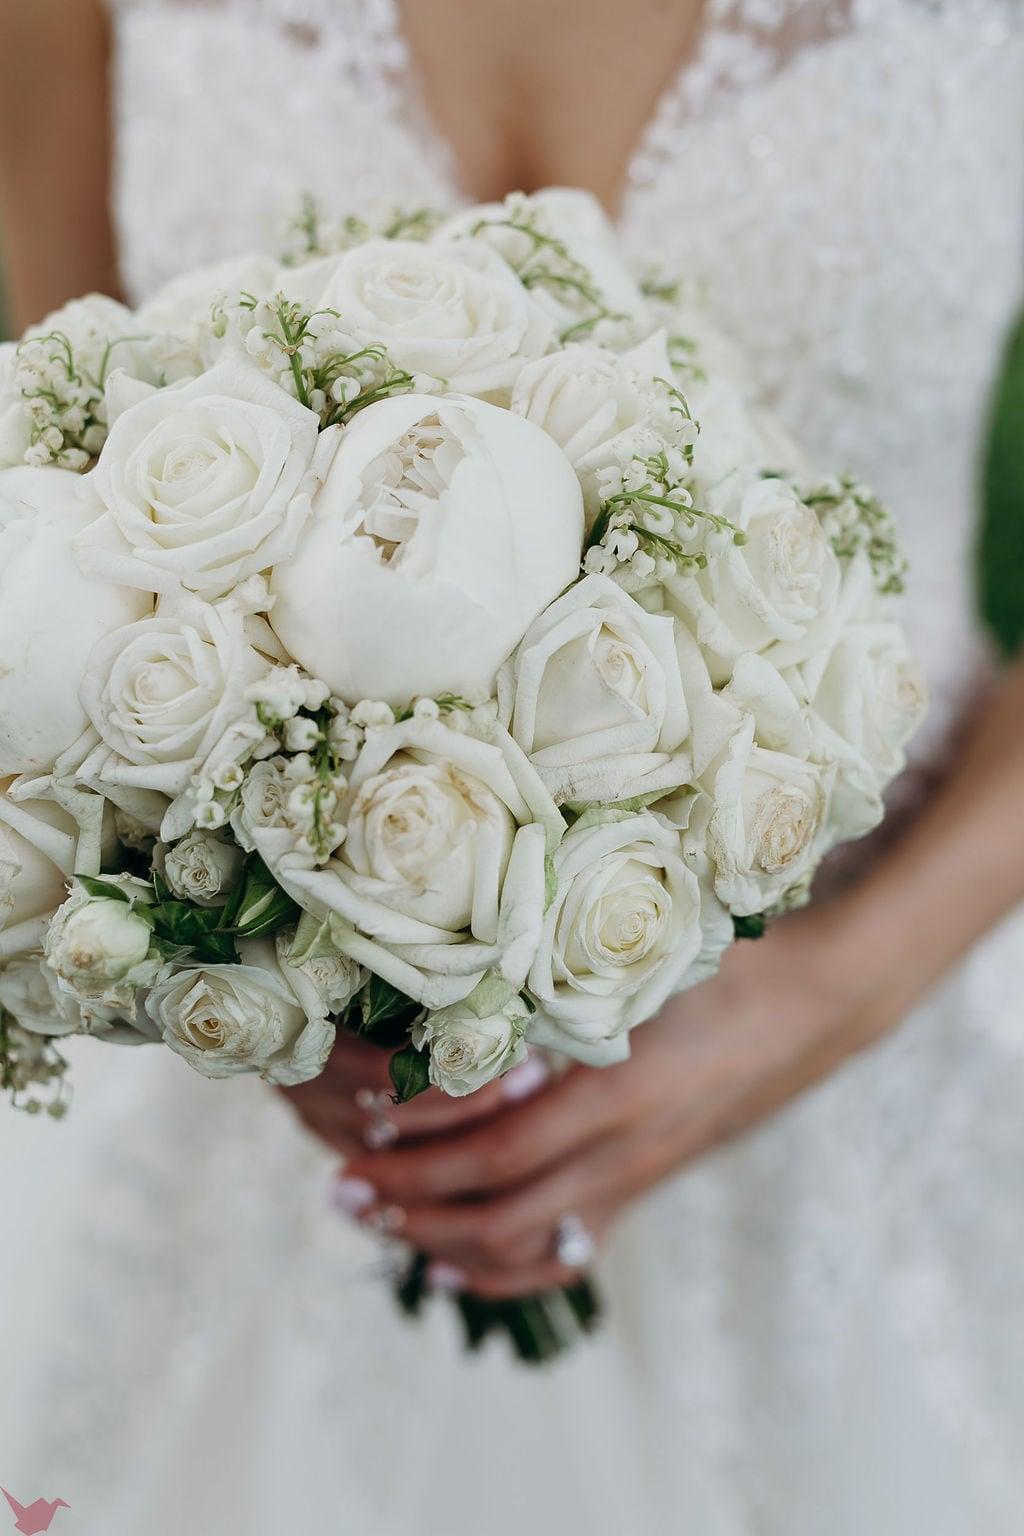 danielle-anthony-papercrane-wedding-photography-27.jpg